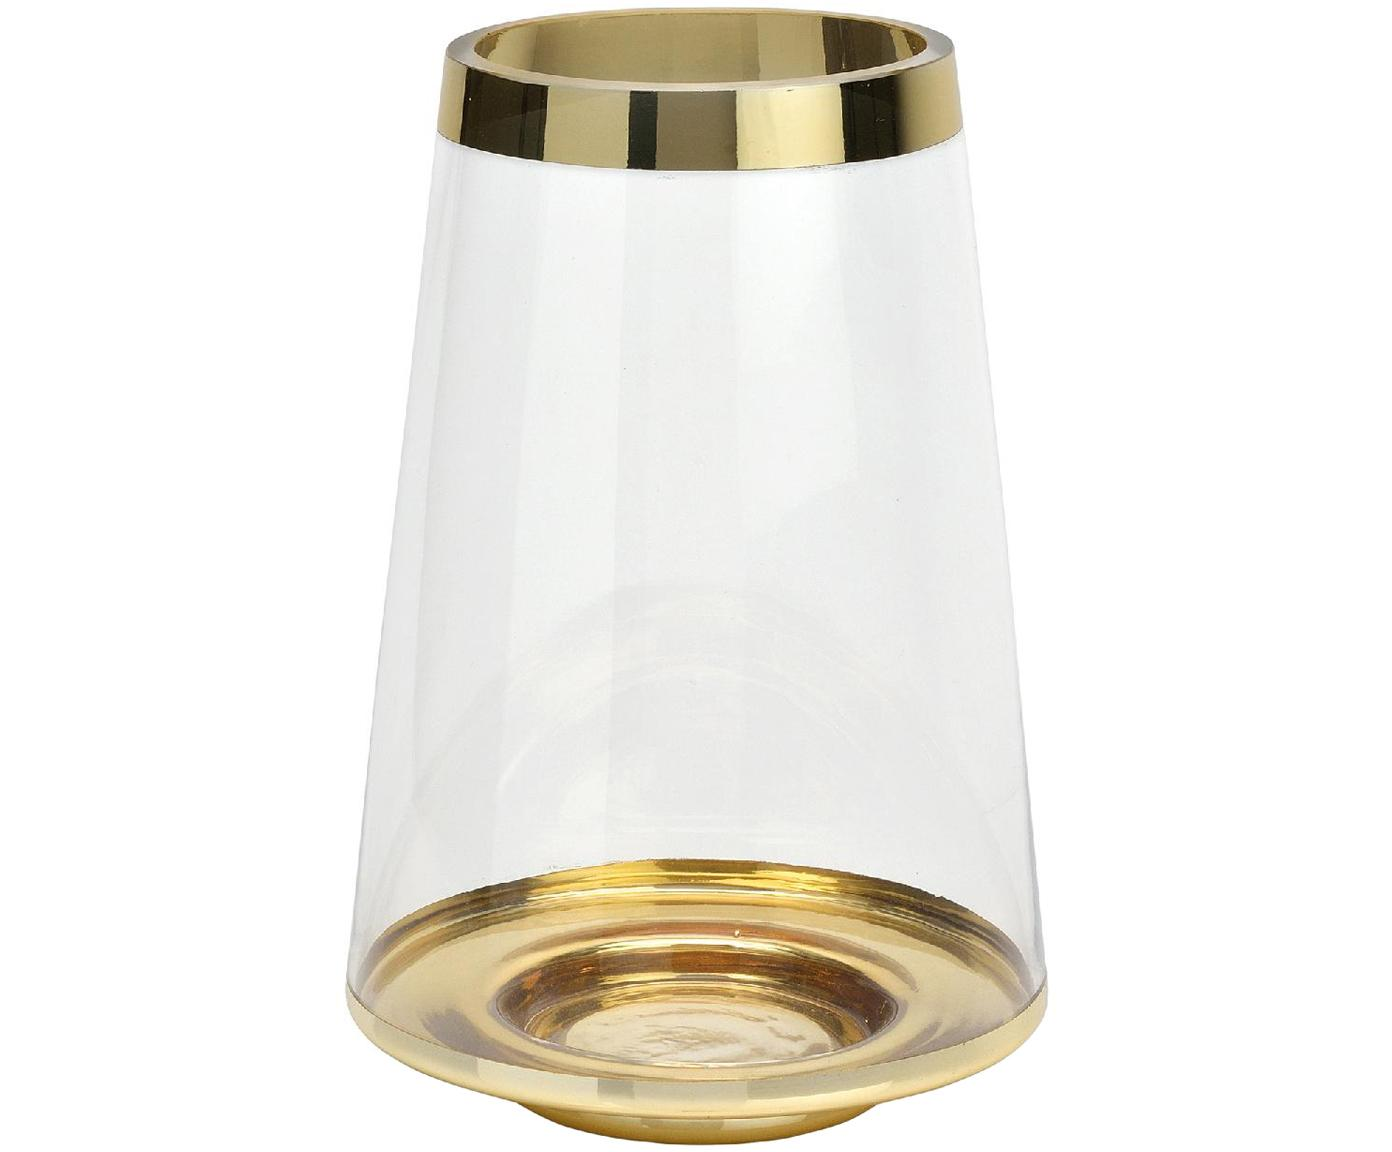 Glas-Vase Lydia mit lackiertem Rand, Glas, Transparent, Goldfarben, Ø 16 x H 25 cm